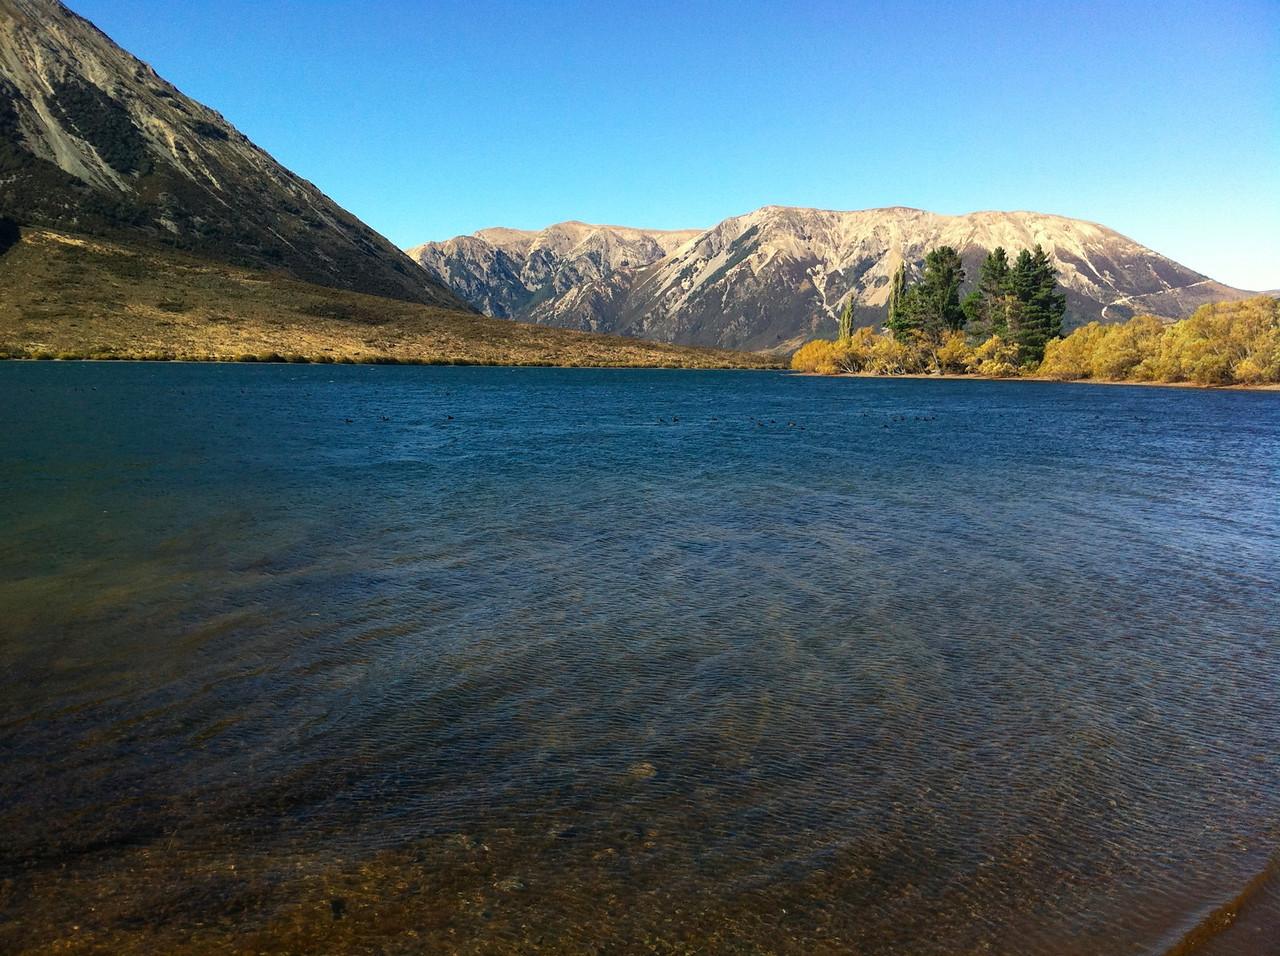 Lake near Arthur's Pass